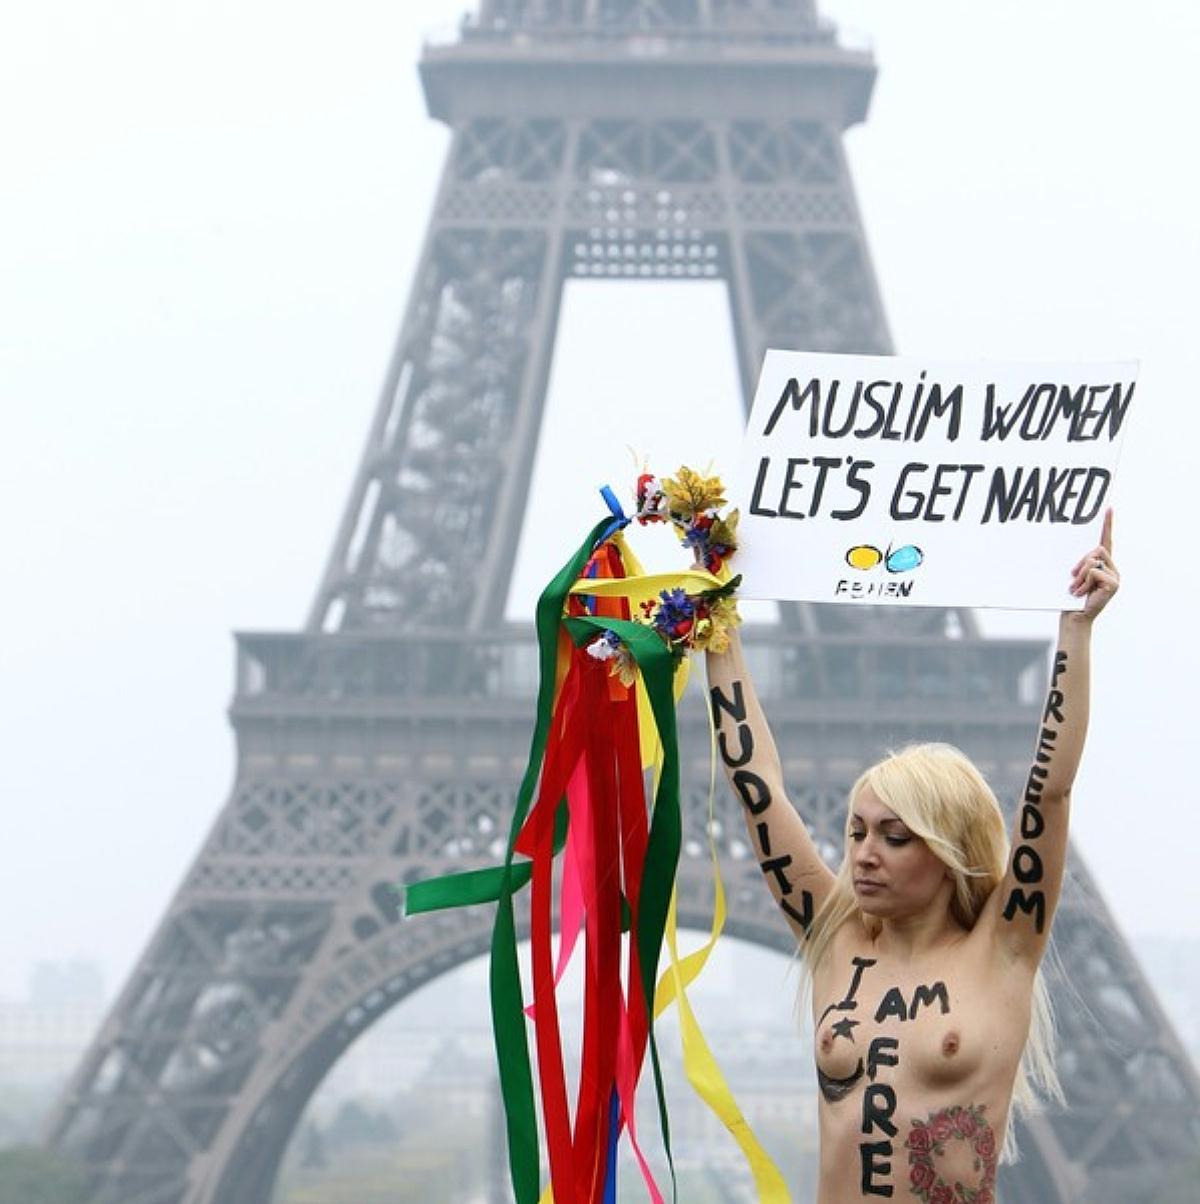 http://1.bp.blogspot.com/-zcok3UCvwkA/T36UYpbXULI/AAAAAAAAPbQ/PG4ejDXVDgI/s1600/Femen+6.jpg